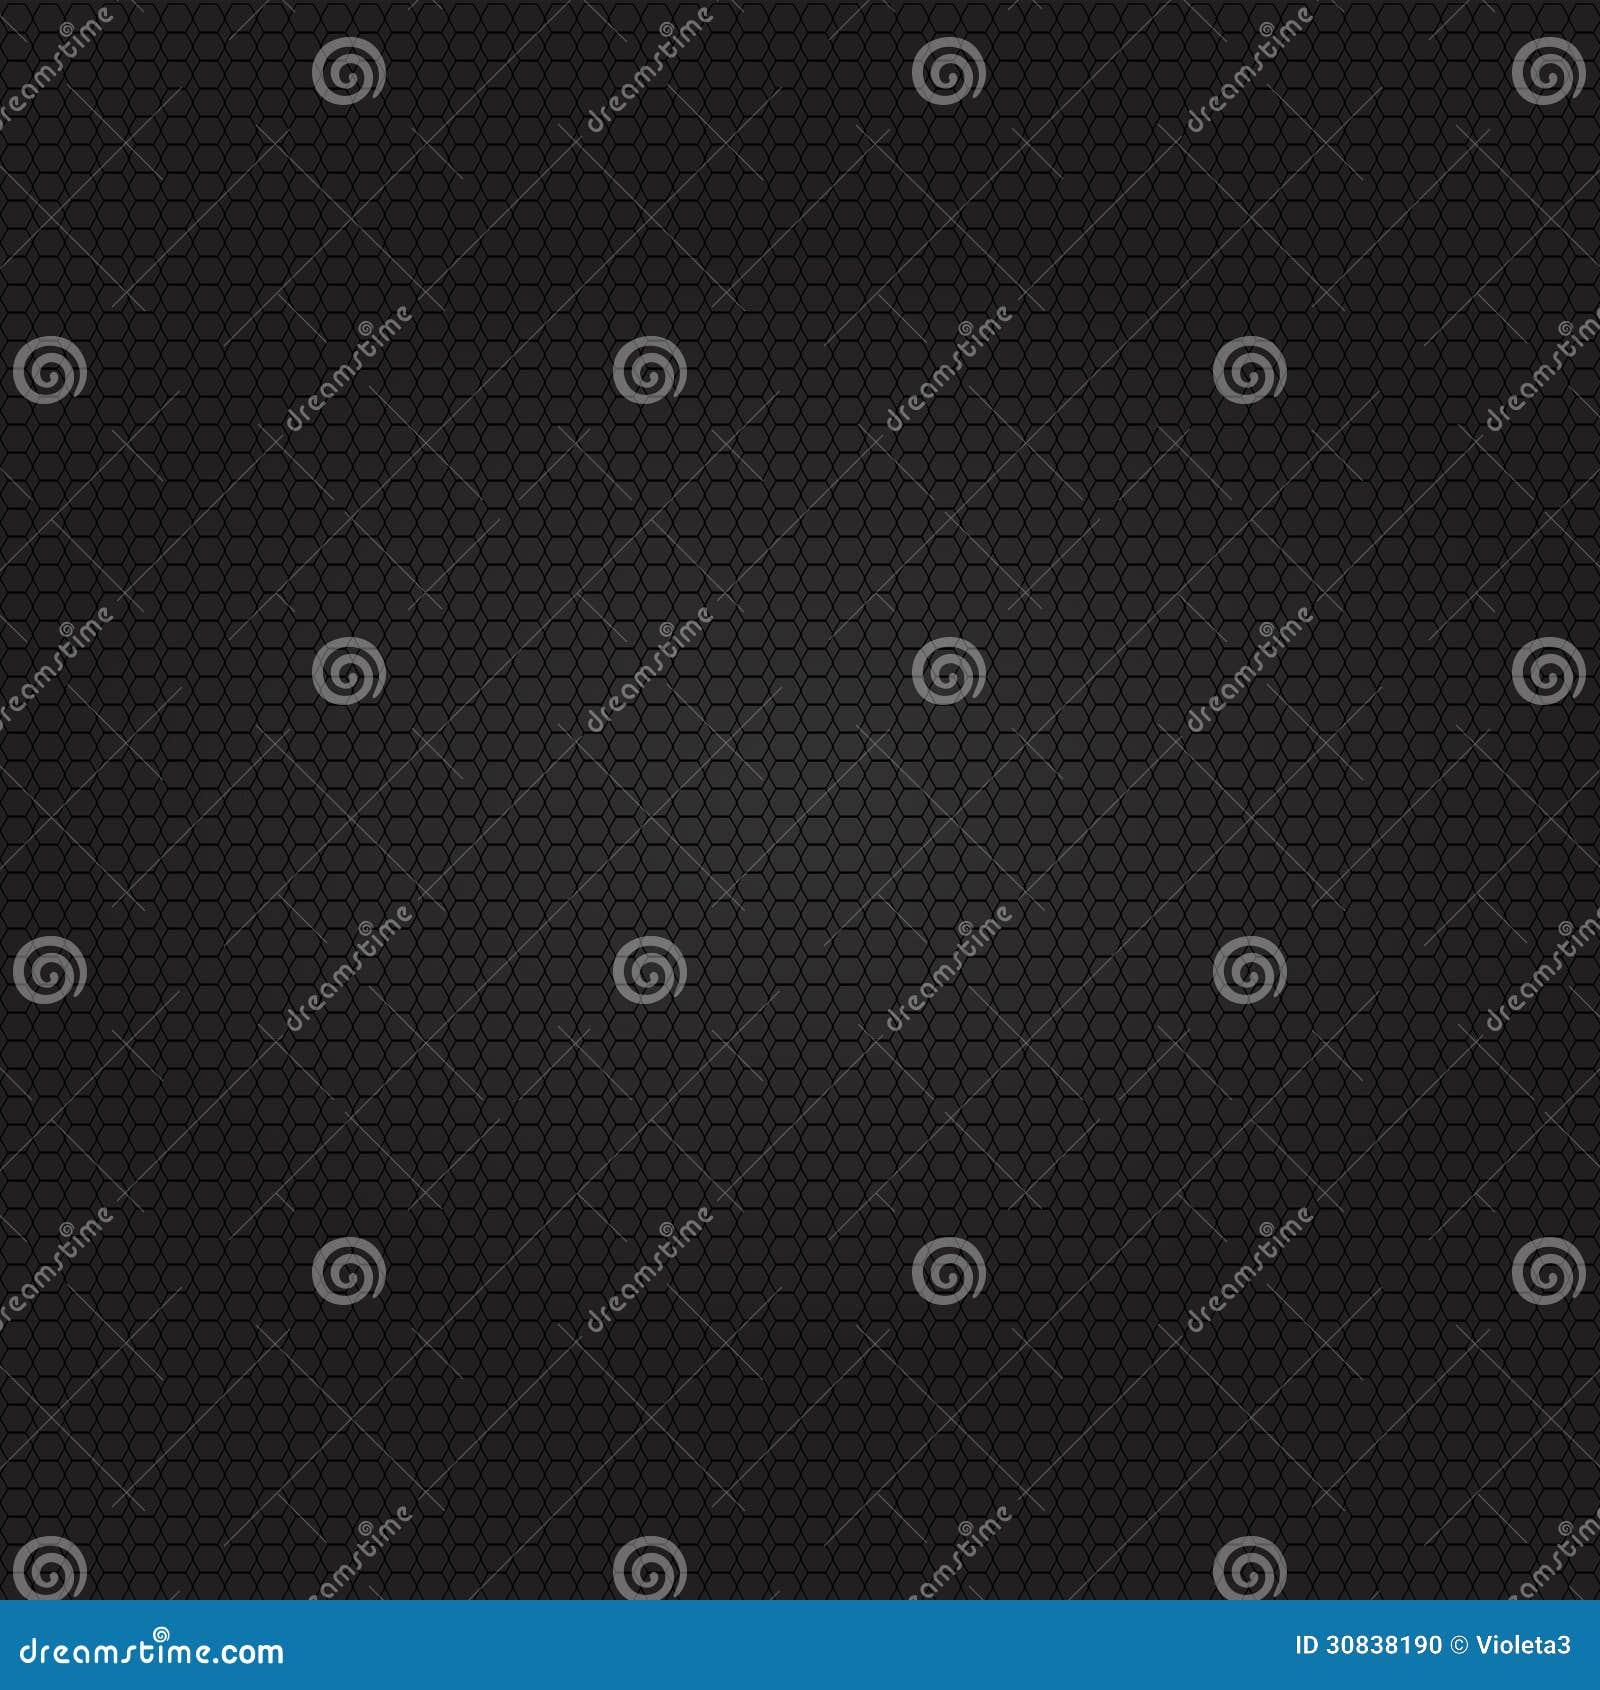 Download Metal texture background stock vector. Illustration of circular - 30838190